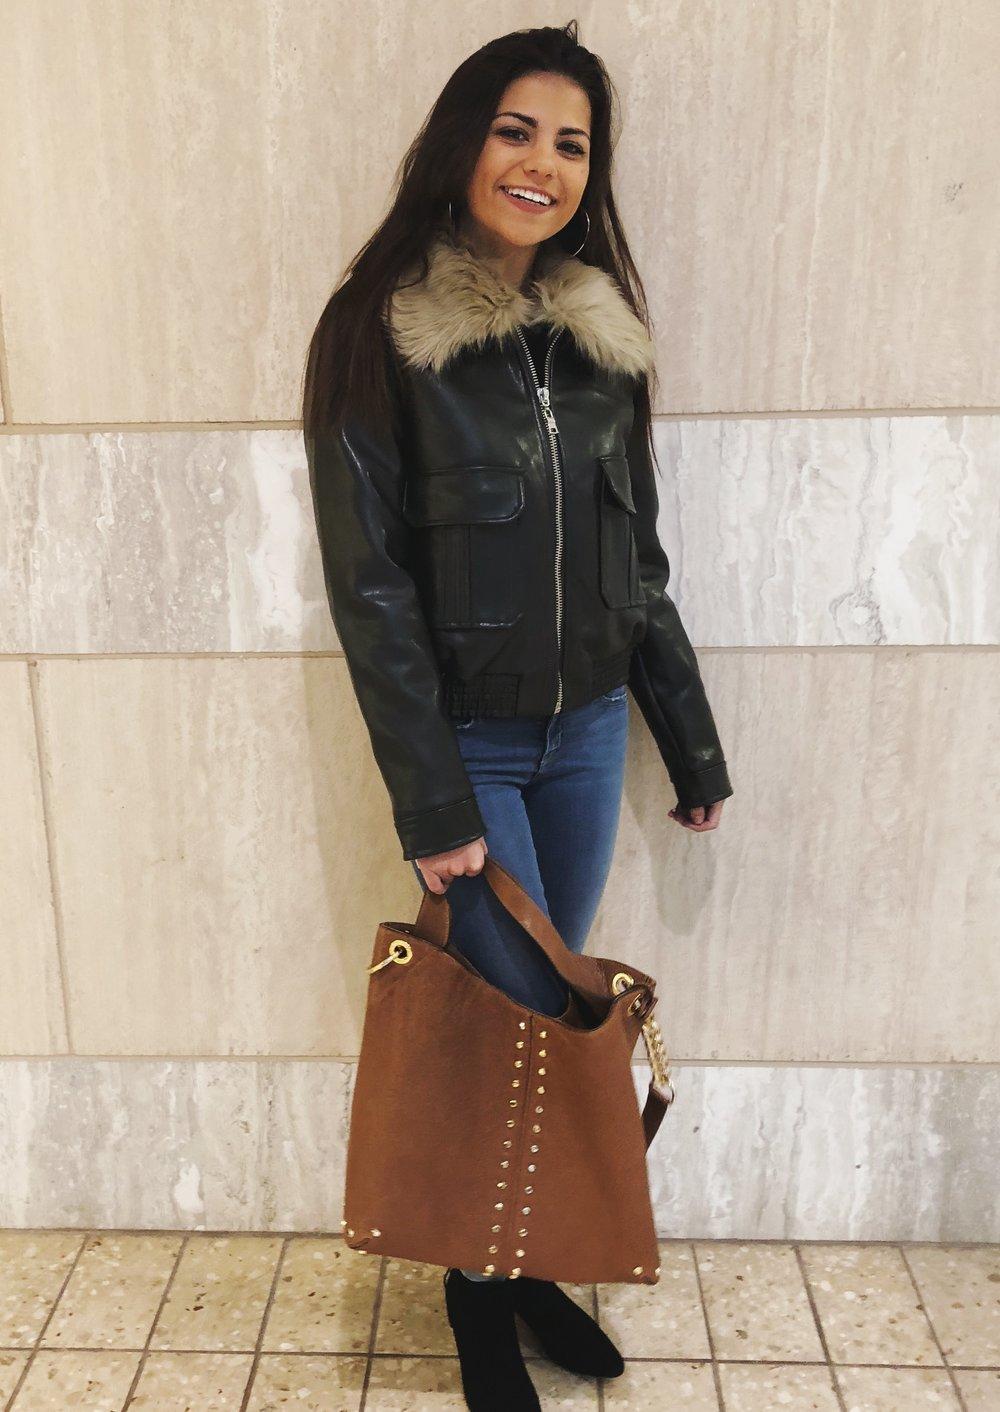 jacket / jeans / bag / shoes